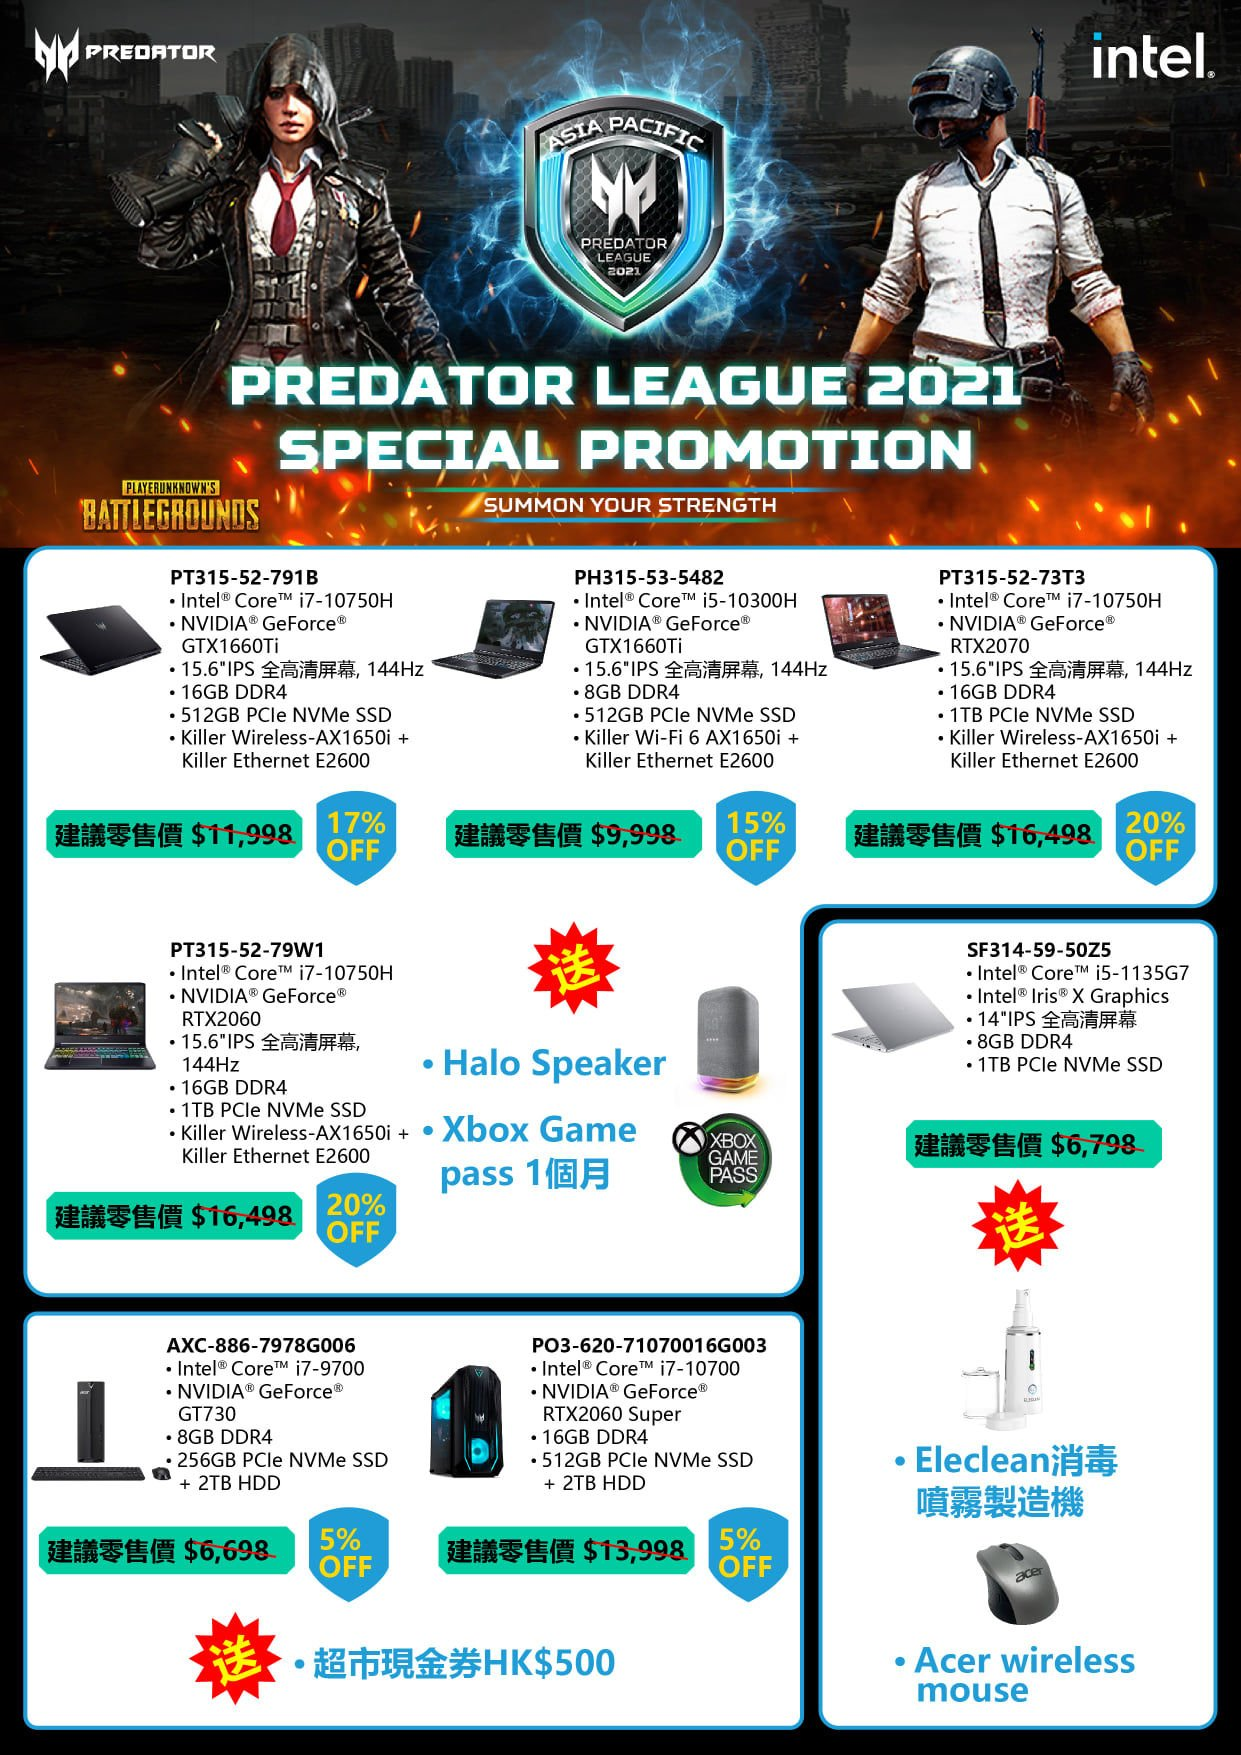 predator league promotion